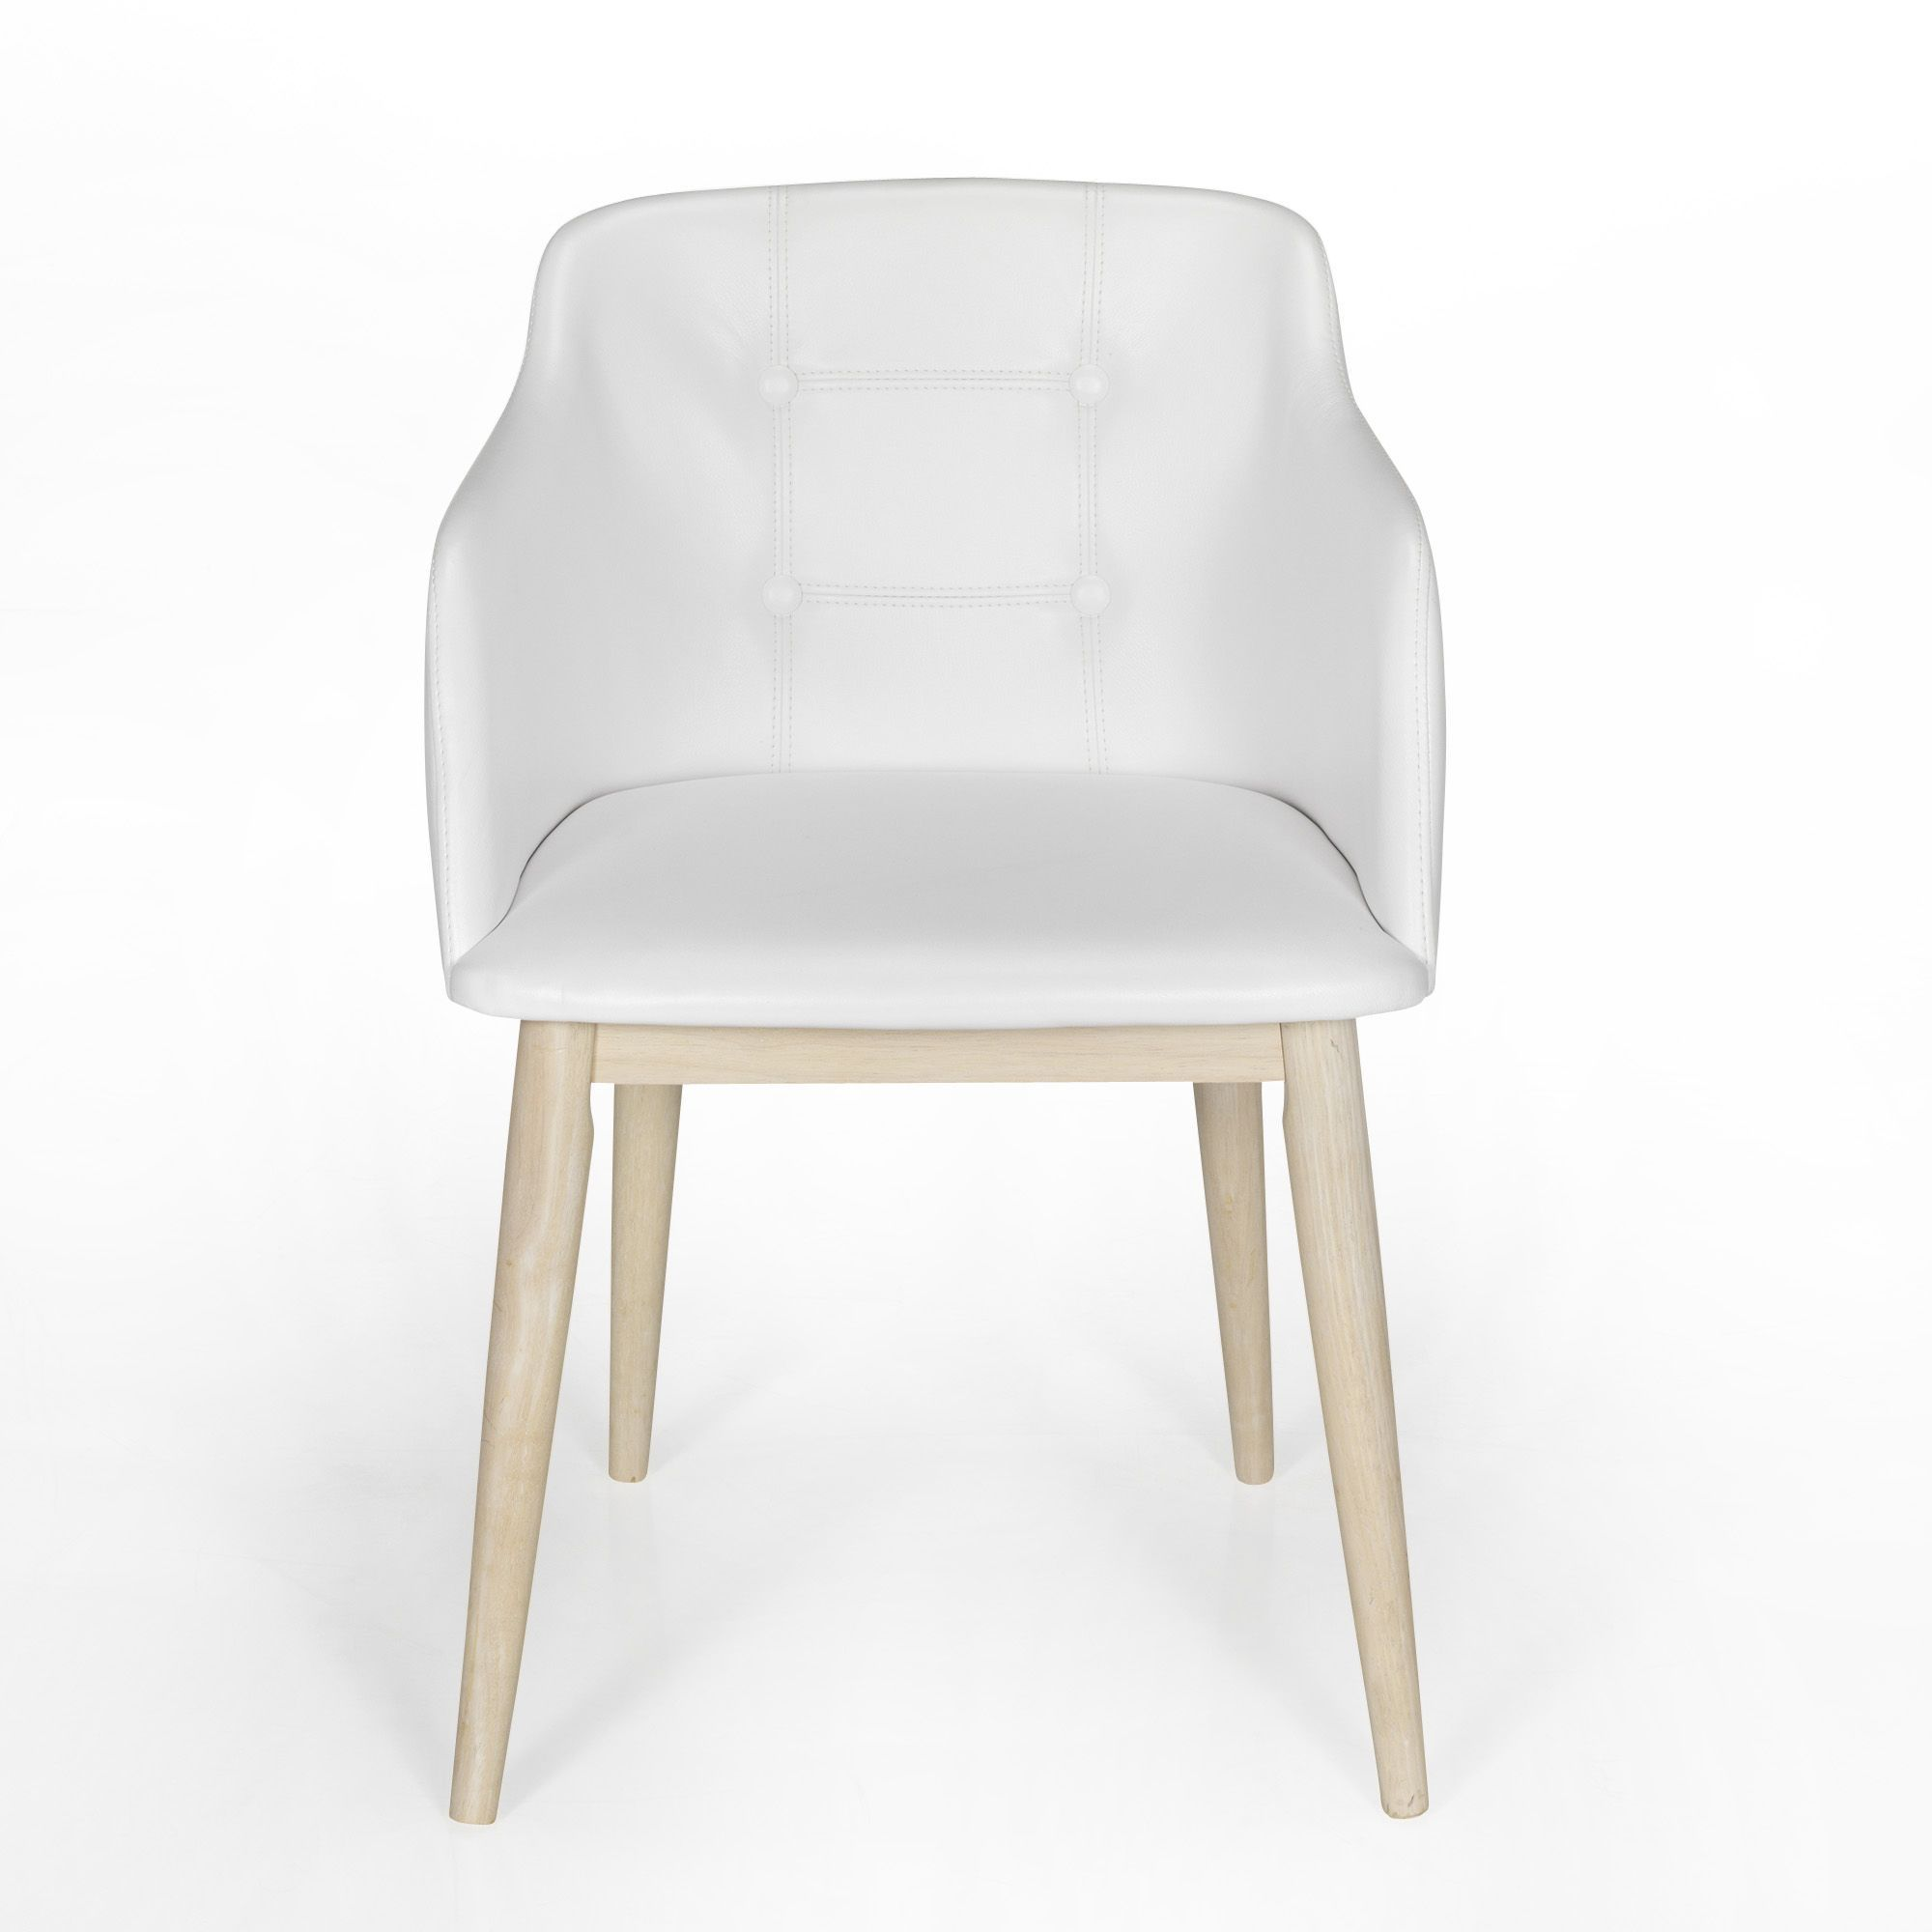 Chaise de s jour capitonn e blanche blanc cork chaises - Alinea chaise salle a manger ...